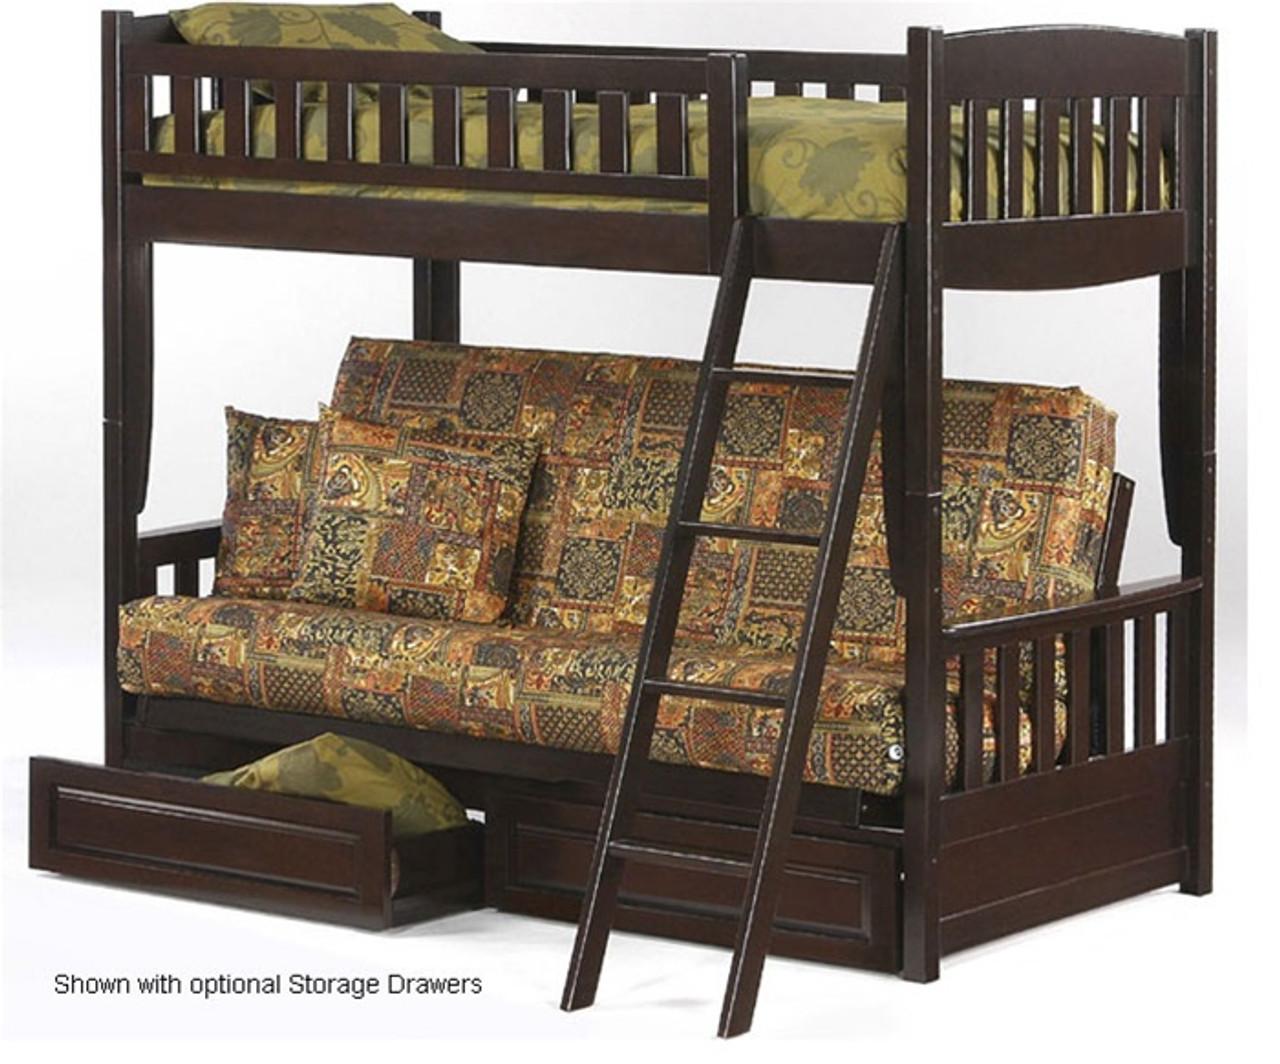 Night And Day Spice Cinnamon Twin Over Futon Bunk Bed In Chocolate Cinnamon Twin Over Futon Bunkbed Furniture In Chocolate Futon Bunk Beds In Chocolate By Night An Day Furniture